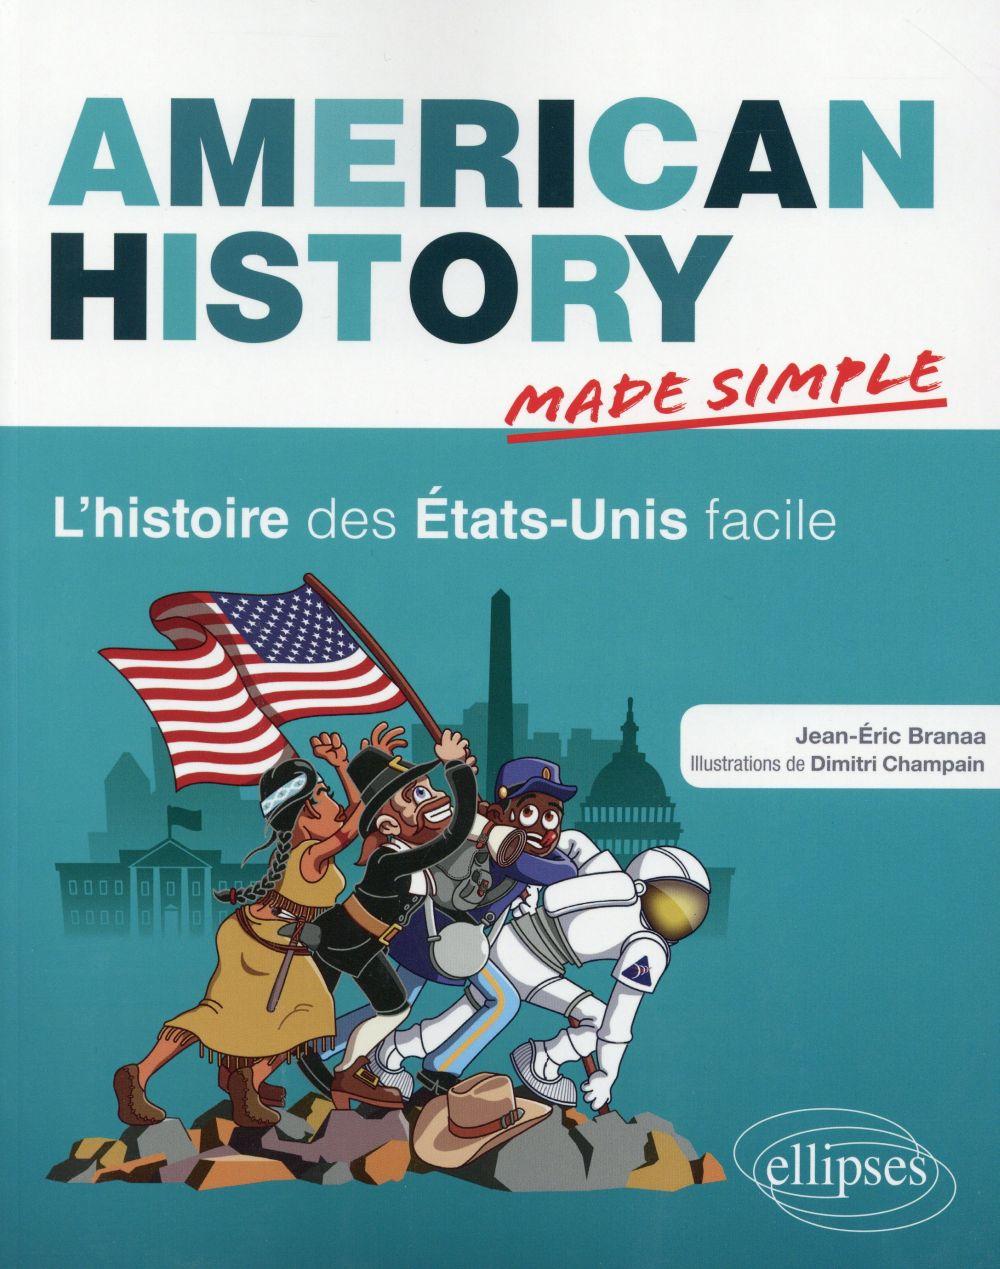 American history made simple ; l'histoire des Etats-Unis facile